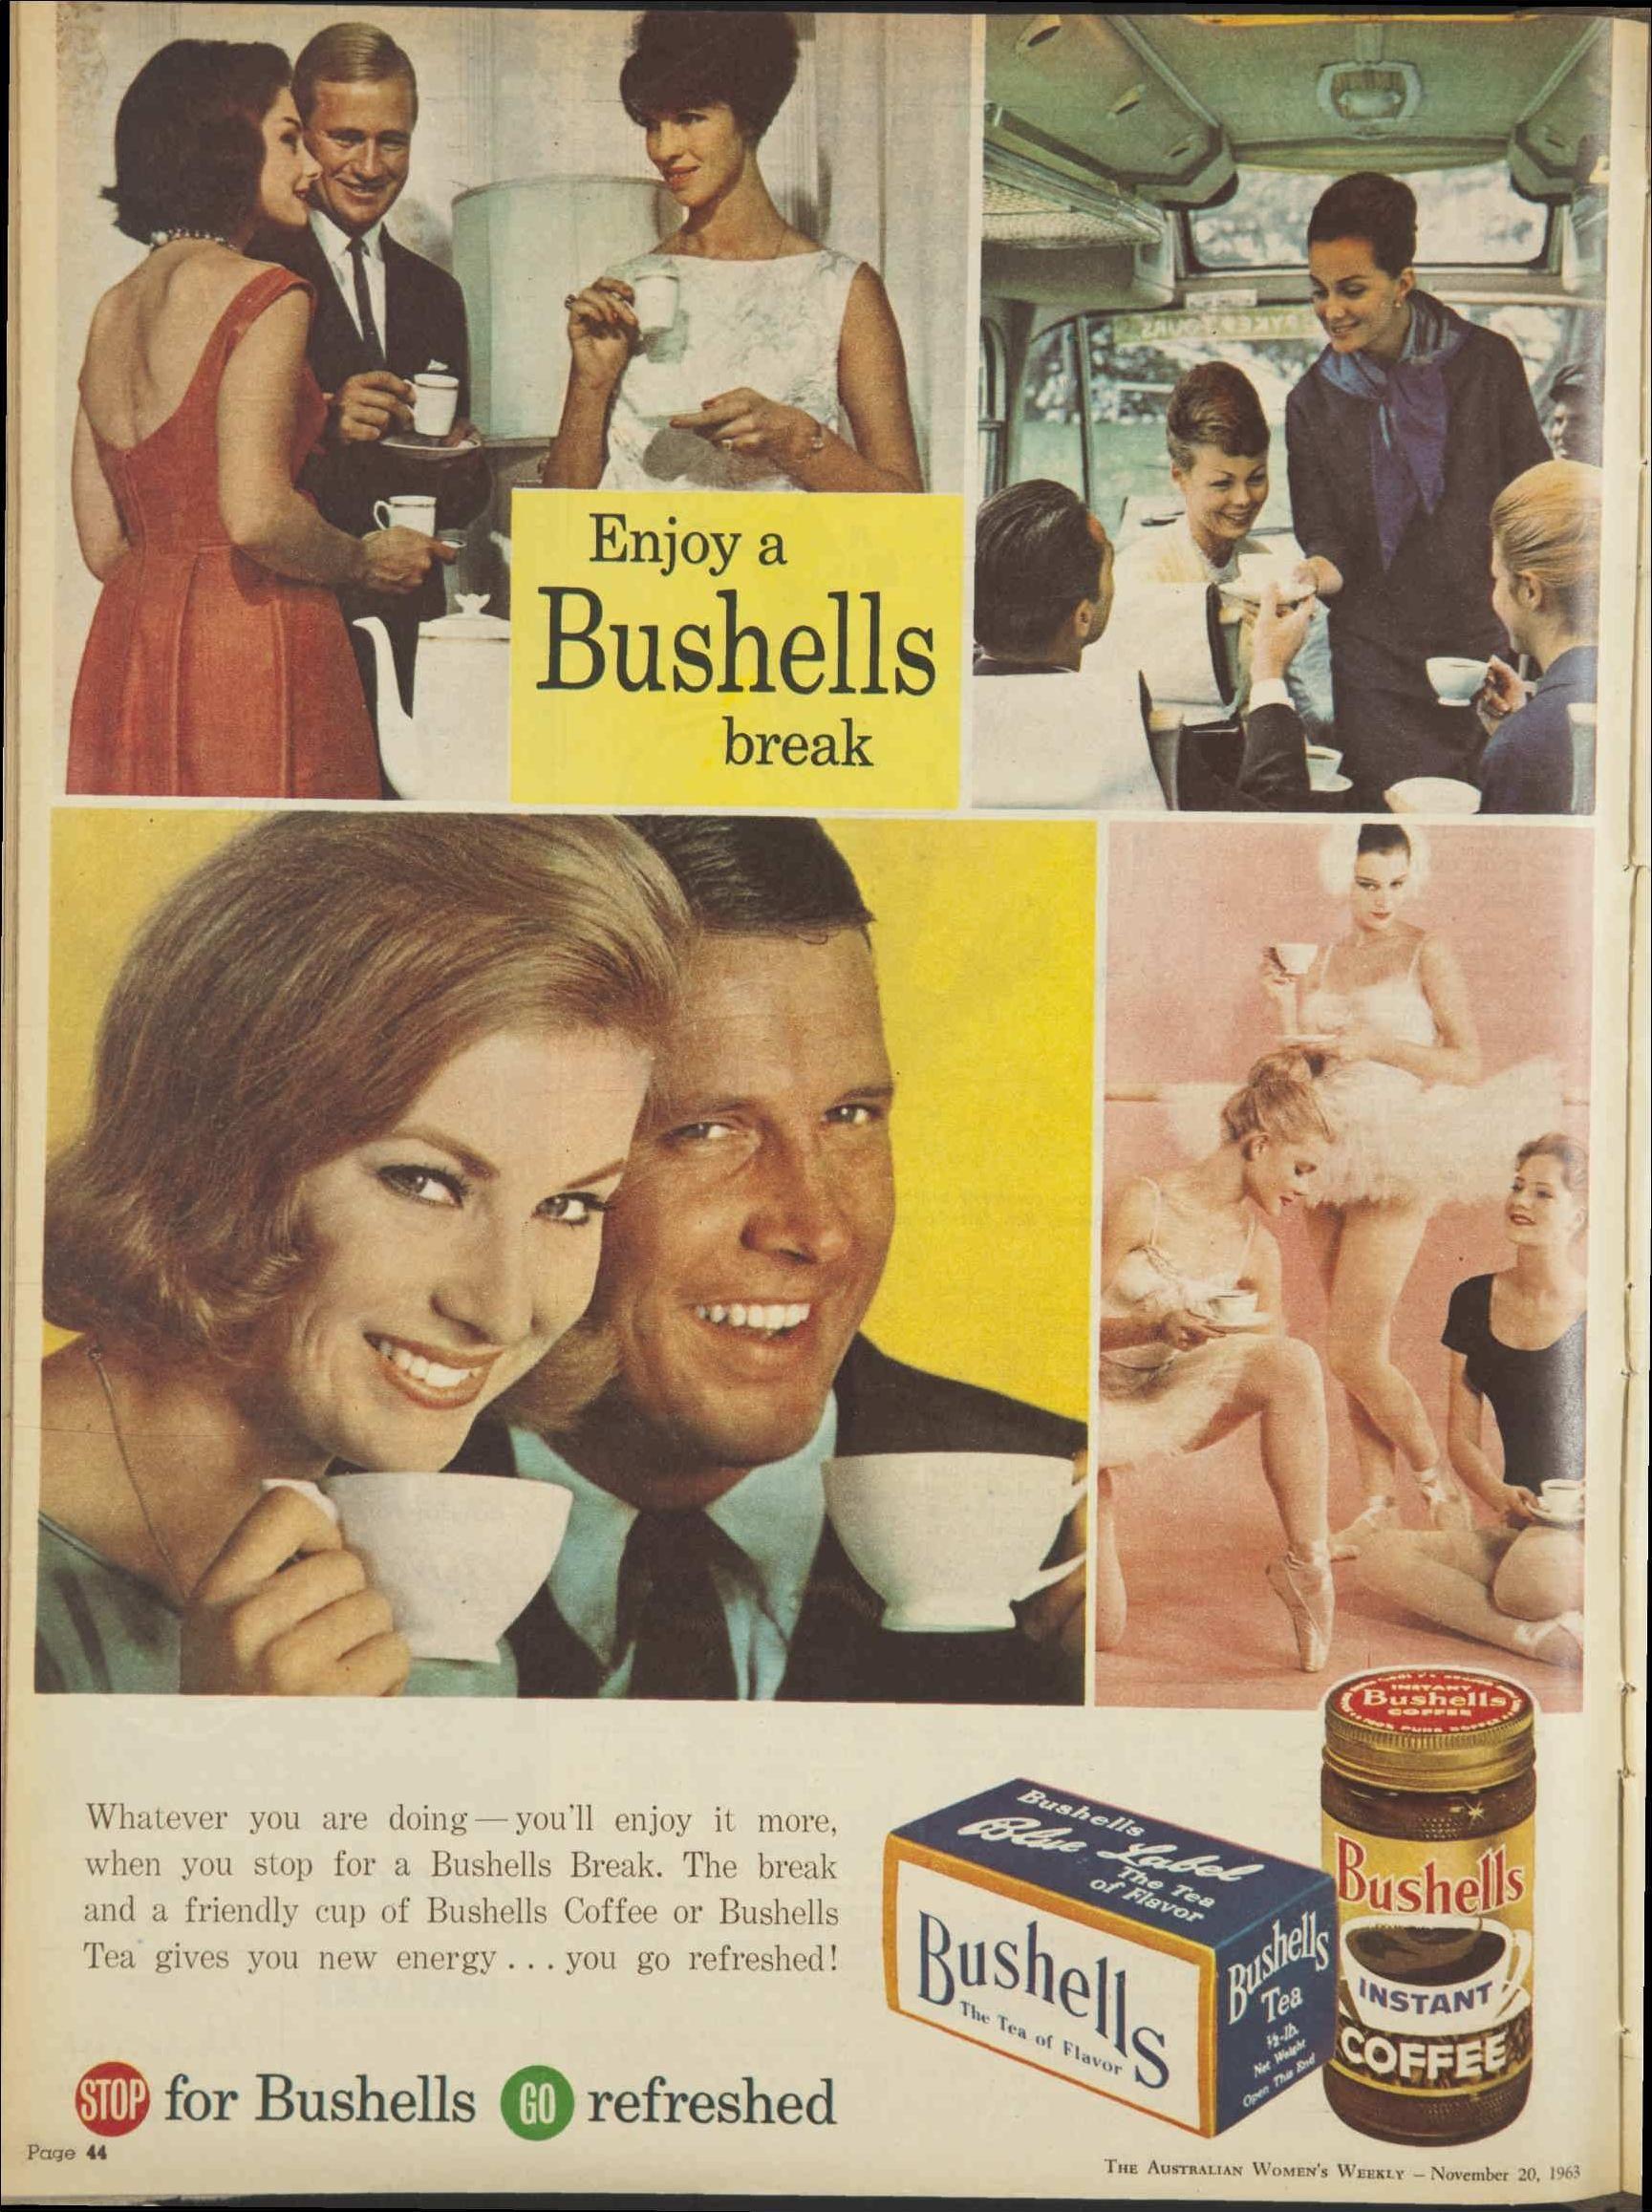 Issue 20 Nov 1963 The Australian Women S Wee Vintage Advertisement Fun Sports Bushells